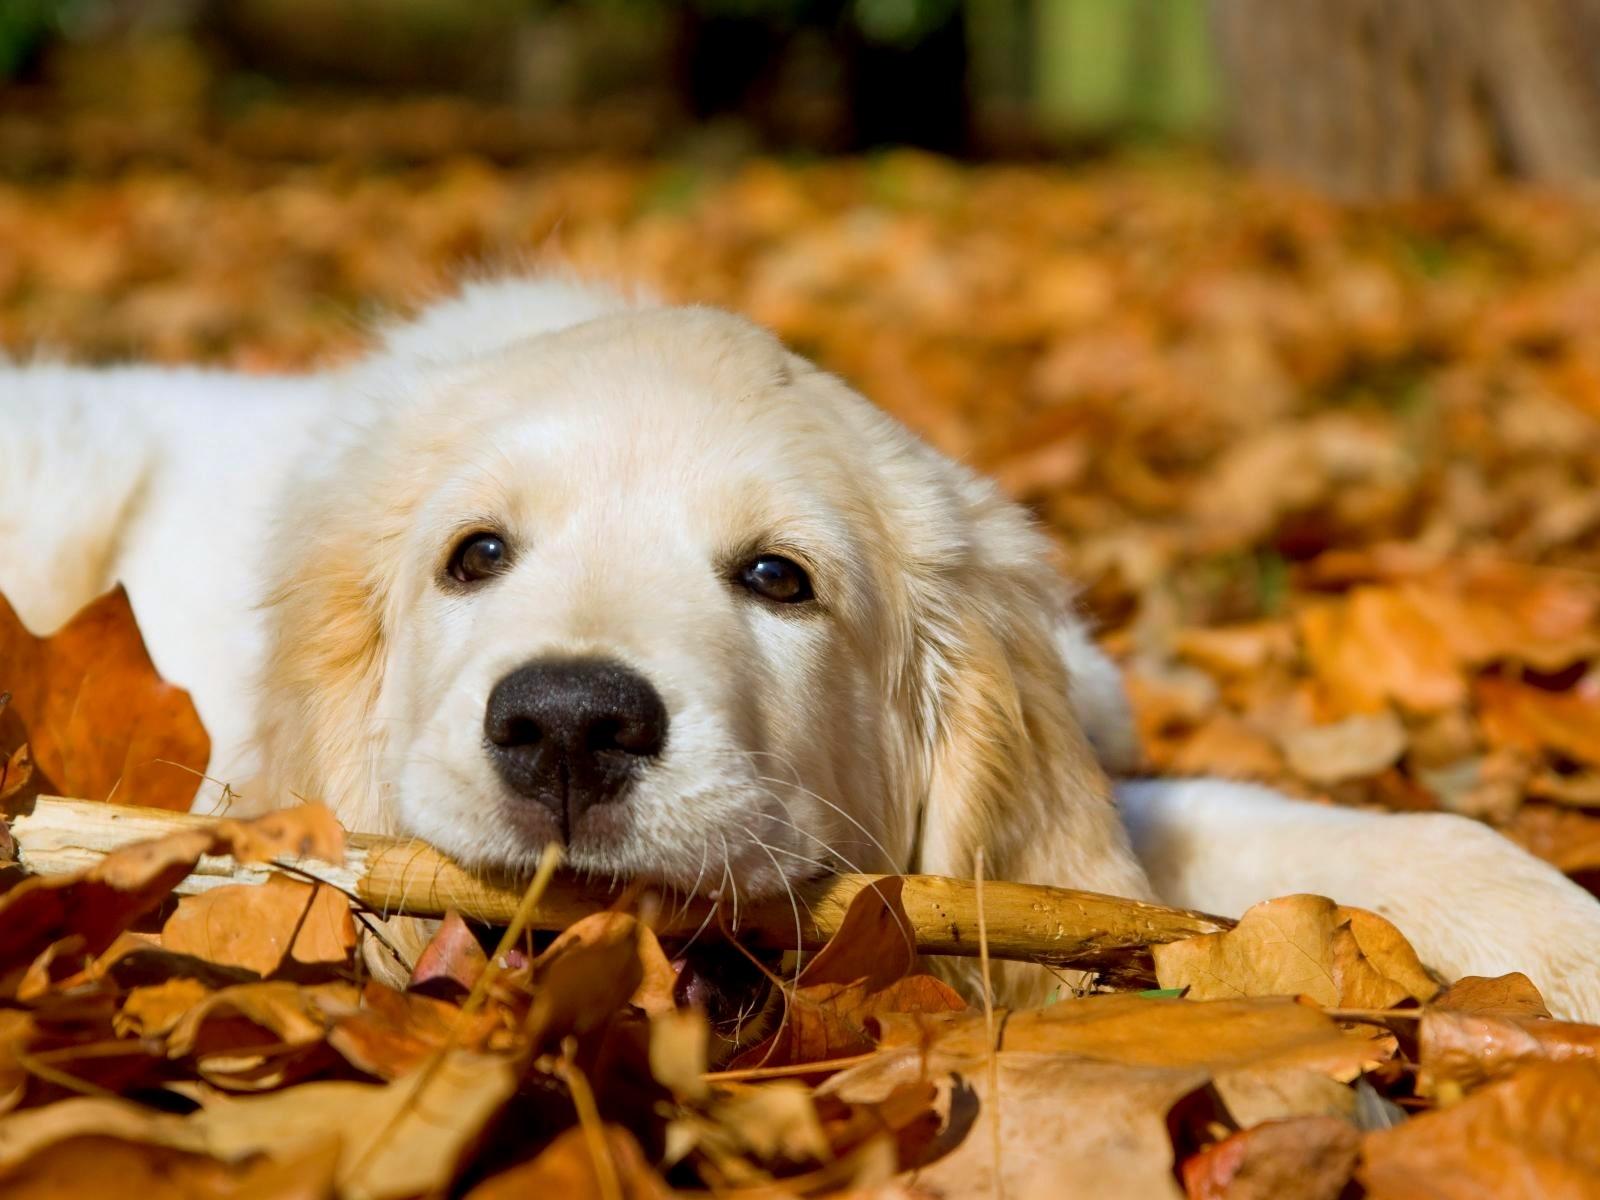 Cute Dog   Dogs Wallpaper 33531410 1600x1200